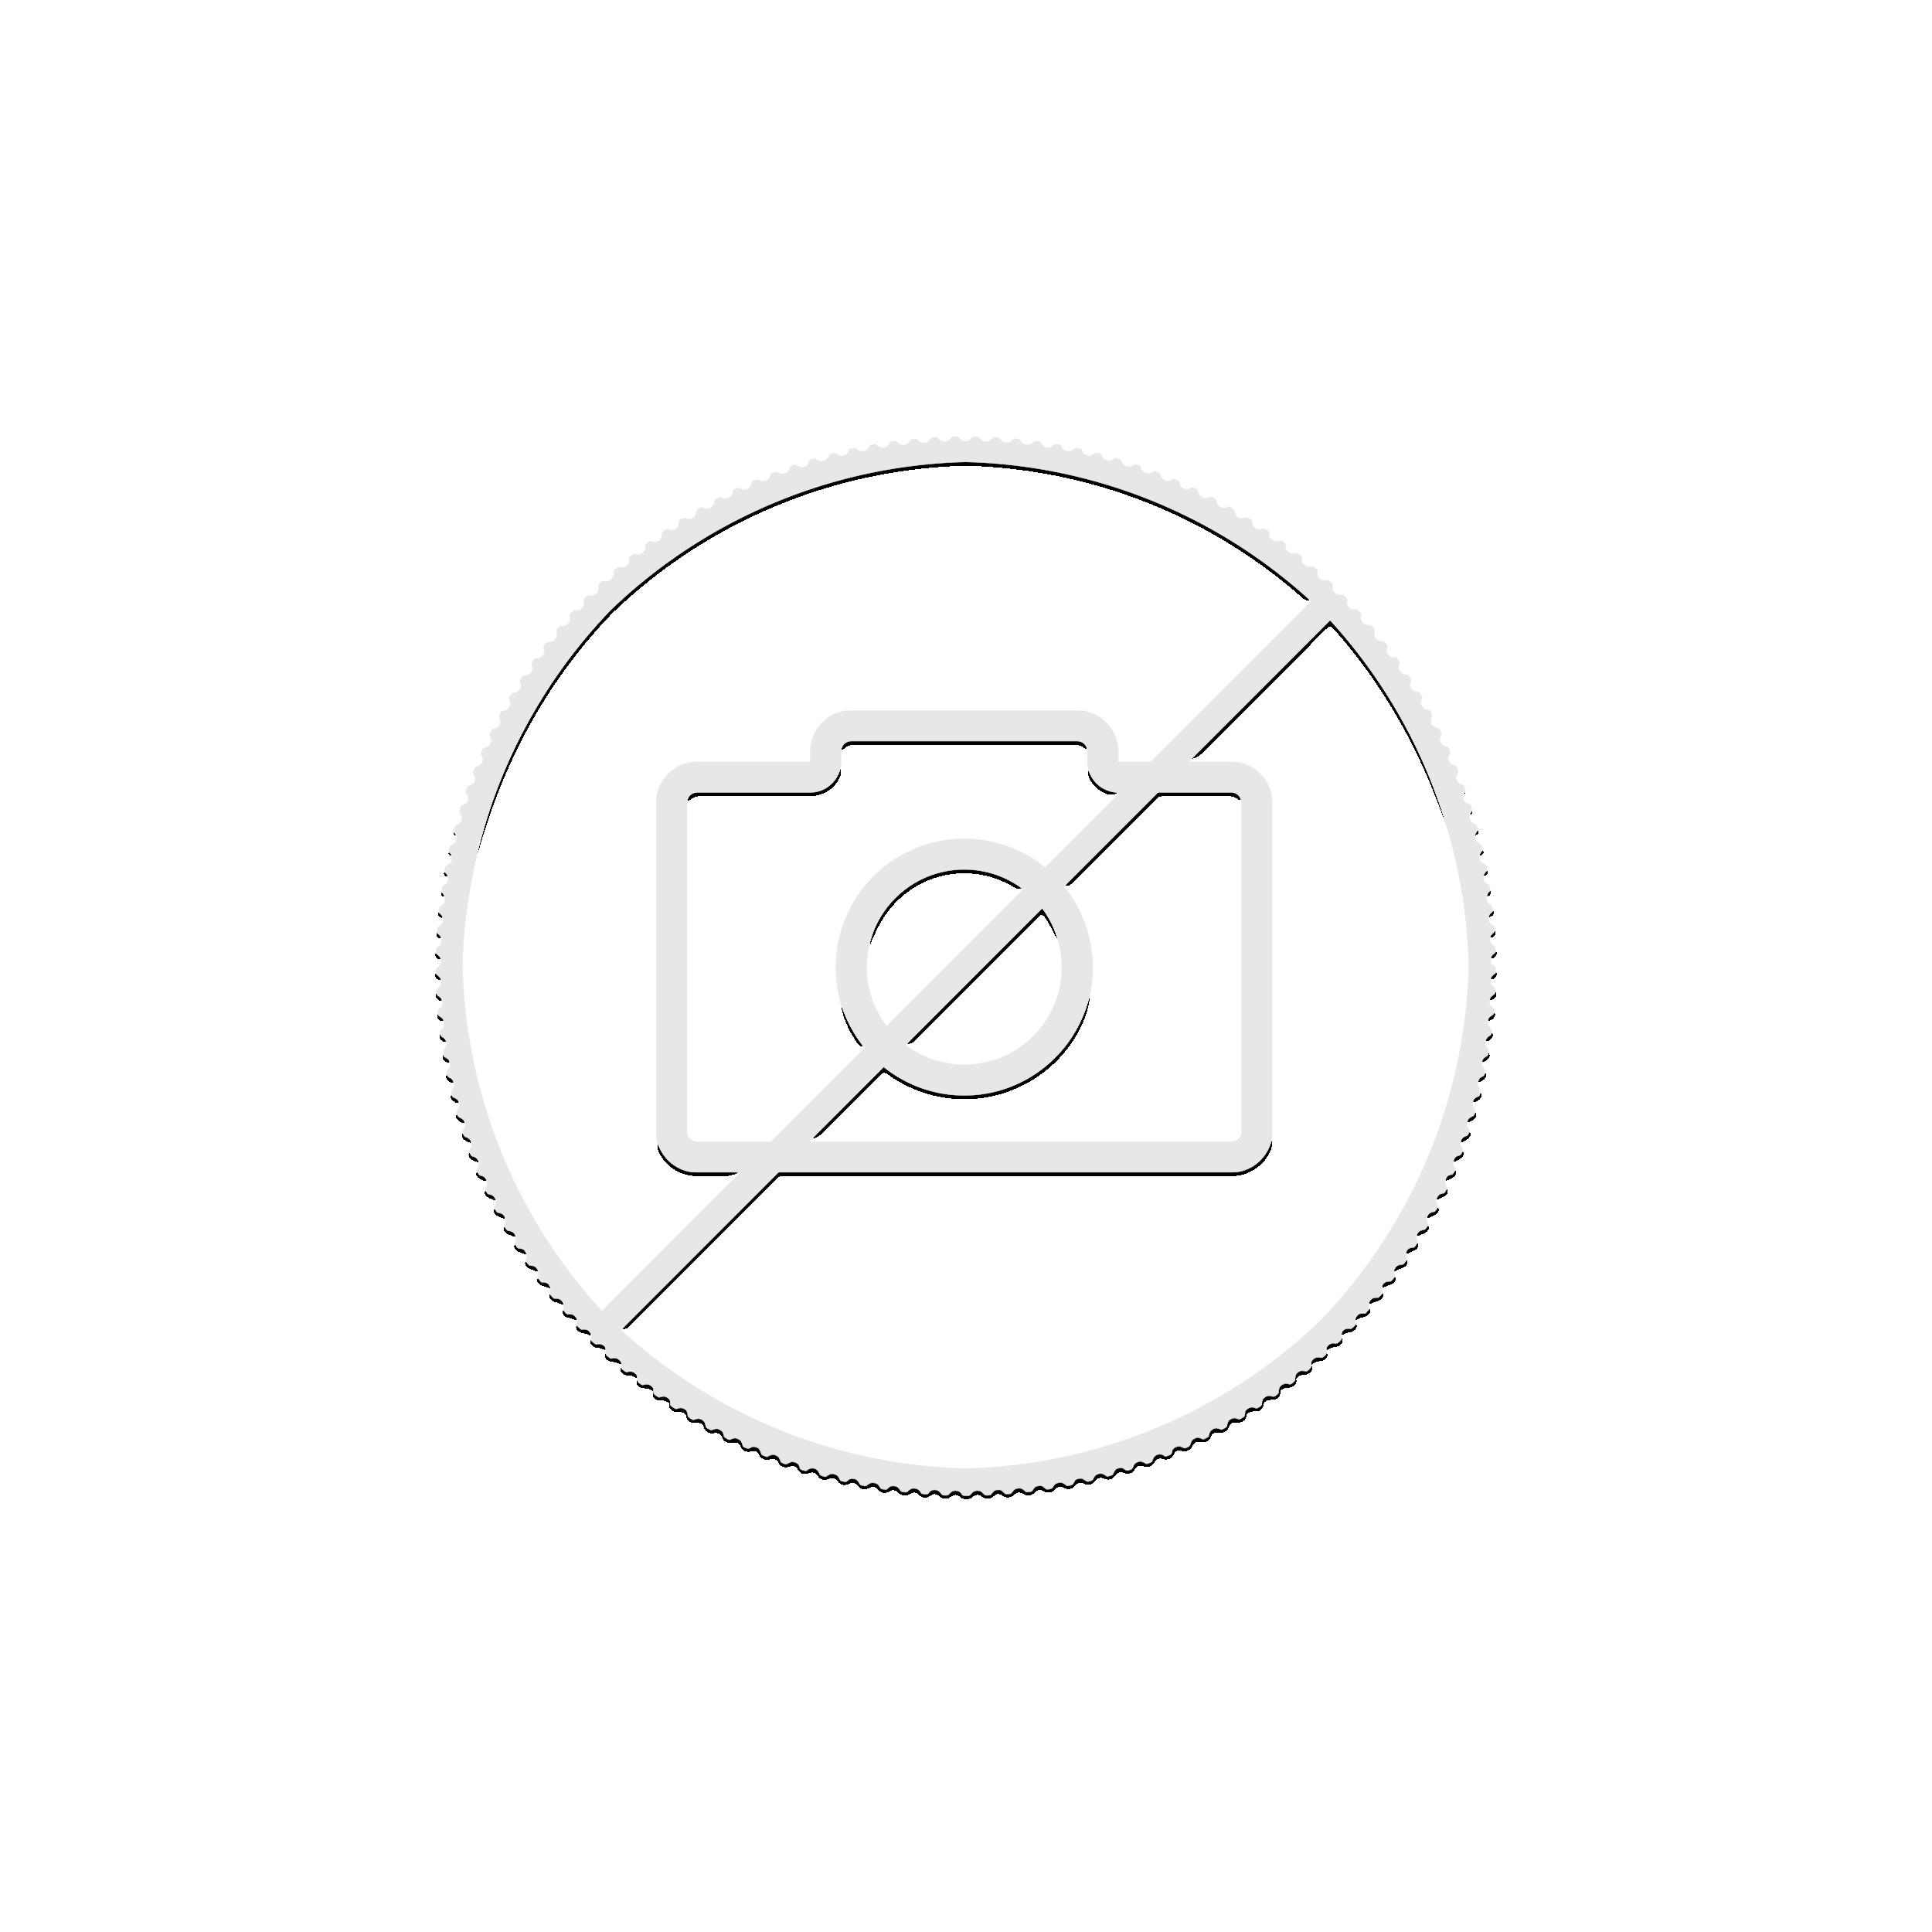 10 troy ounce zilver Kookaburra munt 2016